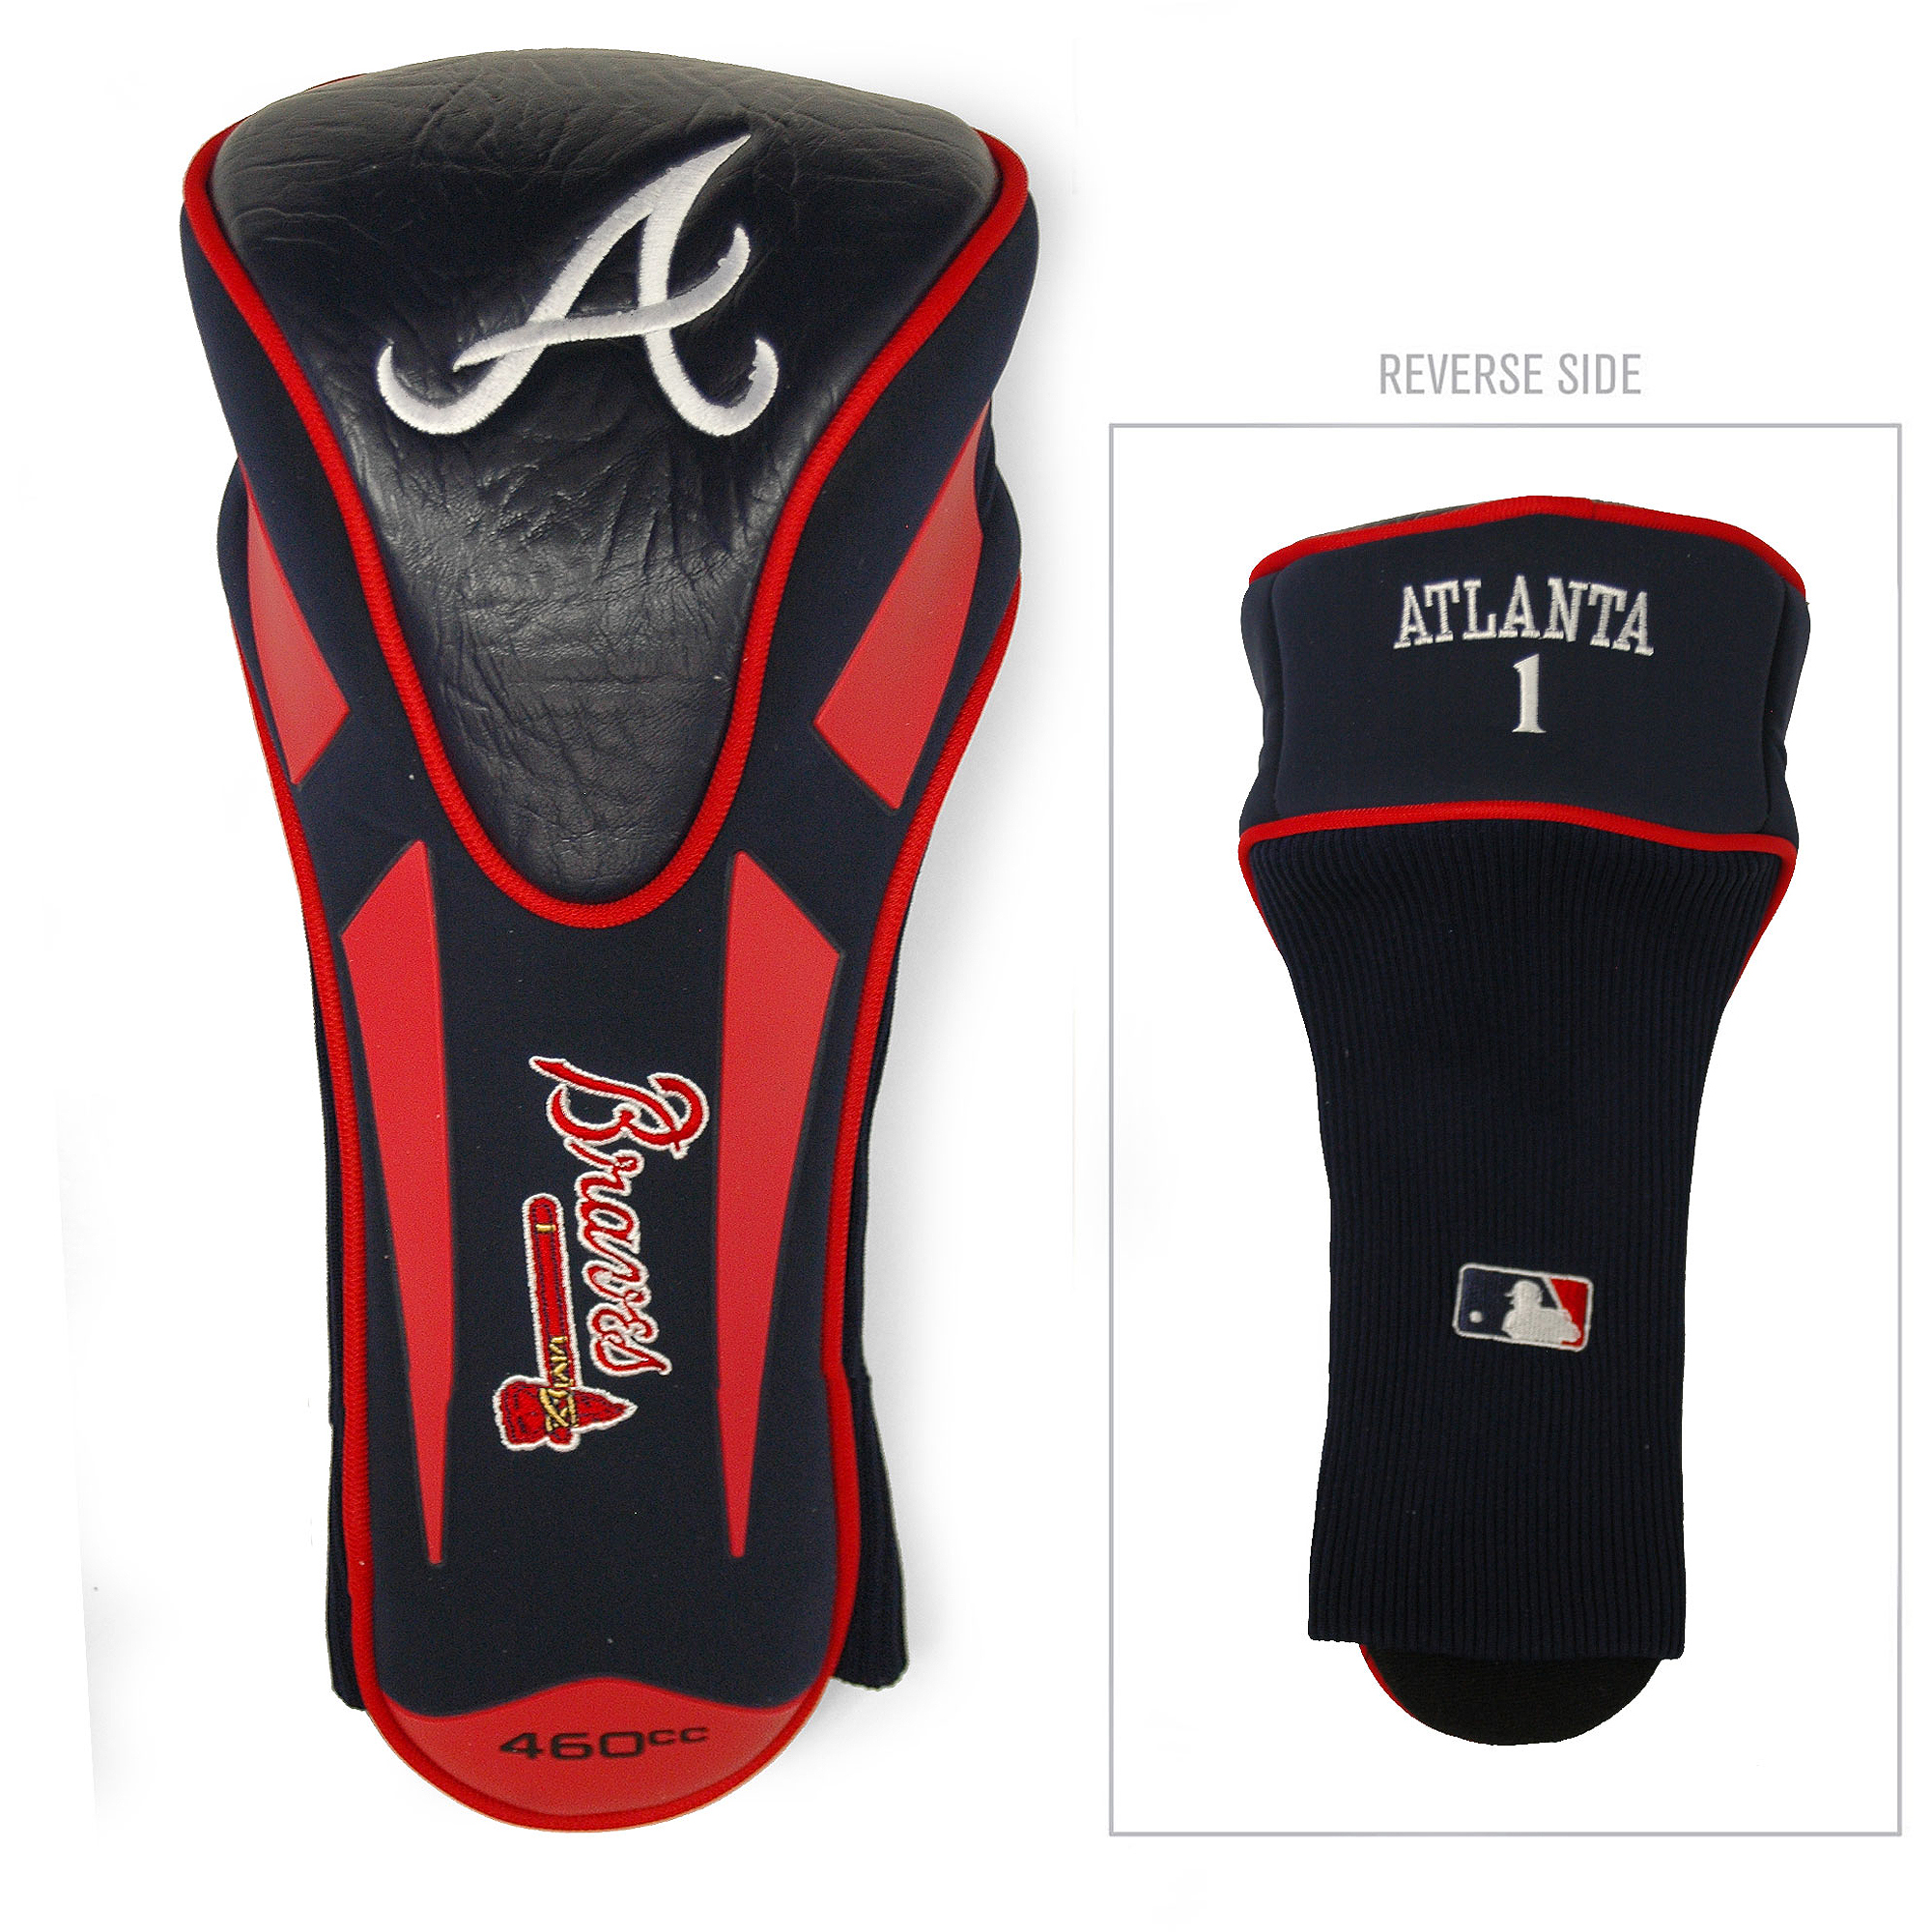 Atlanta Braves Single Apex Head Cover